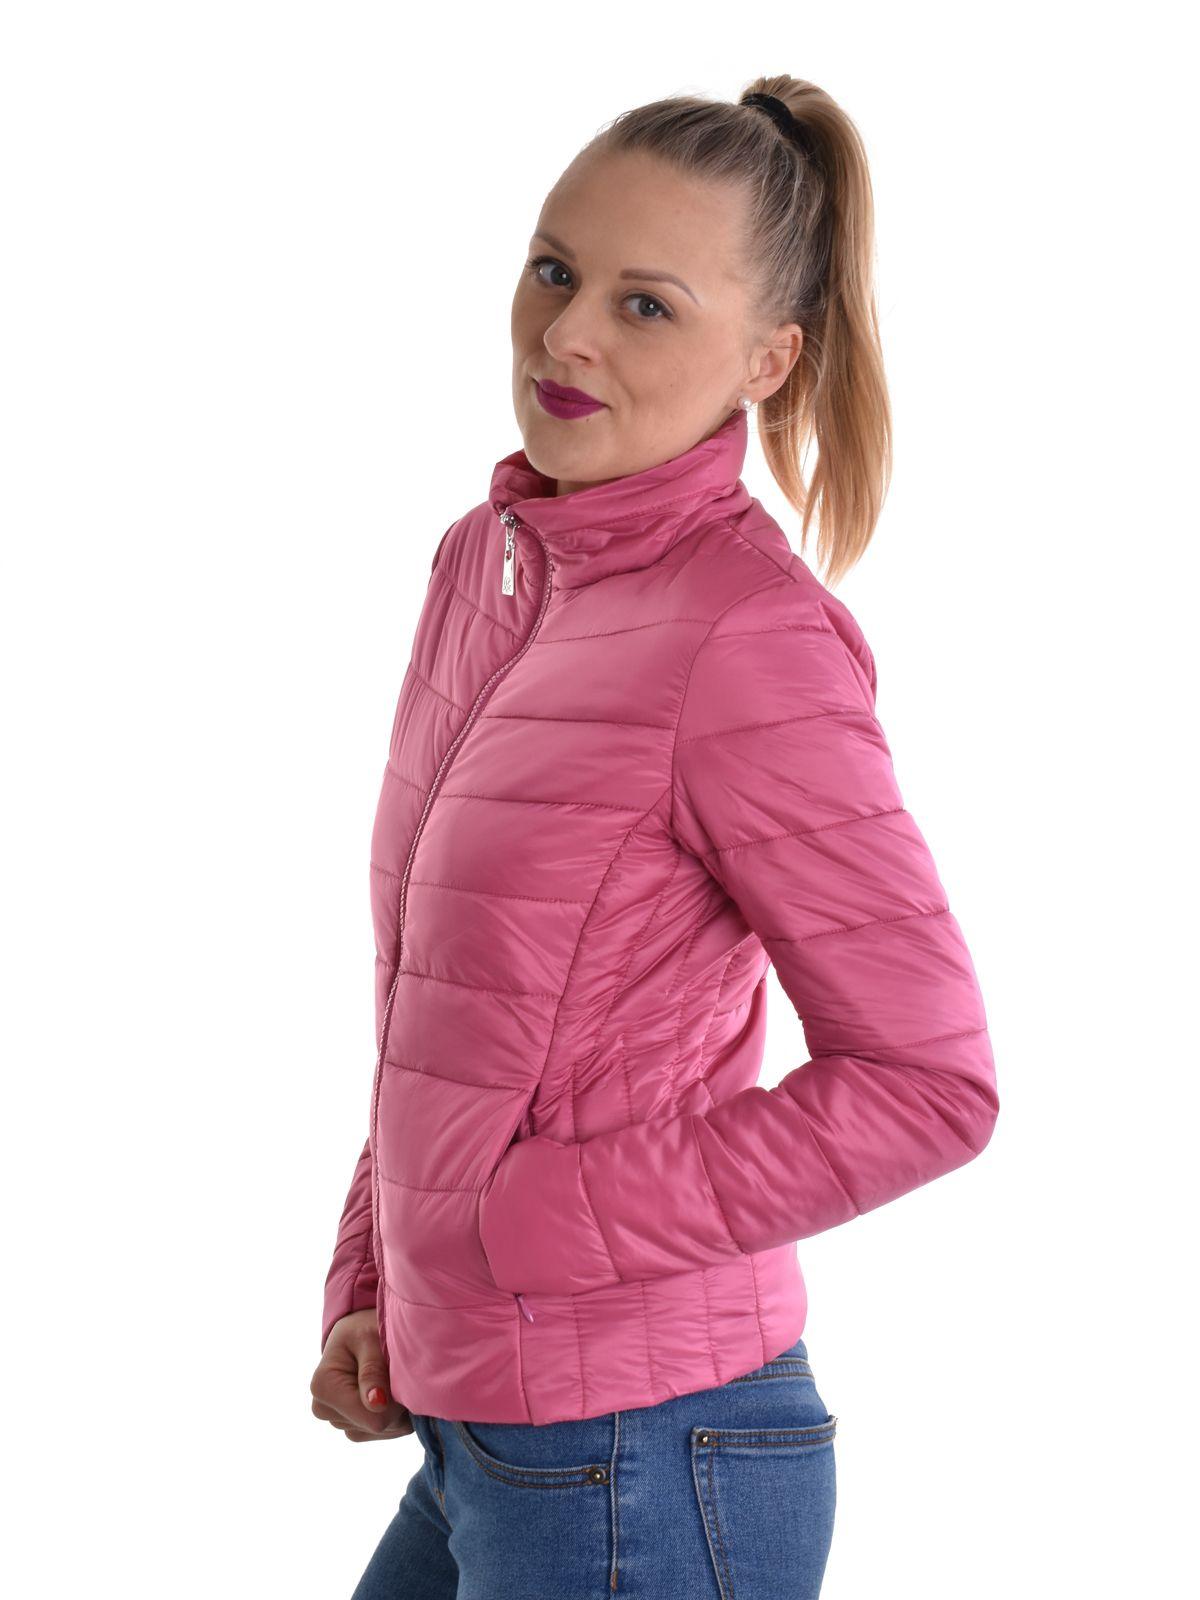 b72b49c8ef Mayo Chix női kabát OMBRE | Markasbolt.hu Hivatalos Mayo Chix forgalmazó